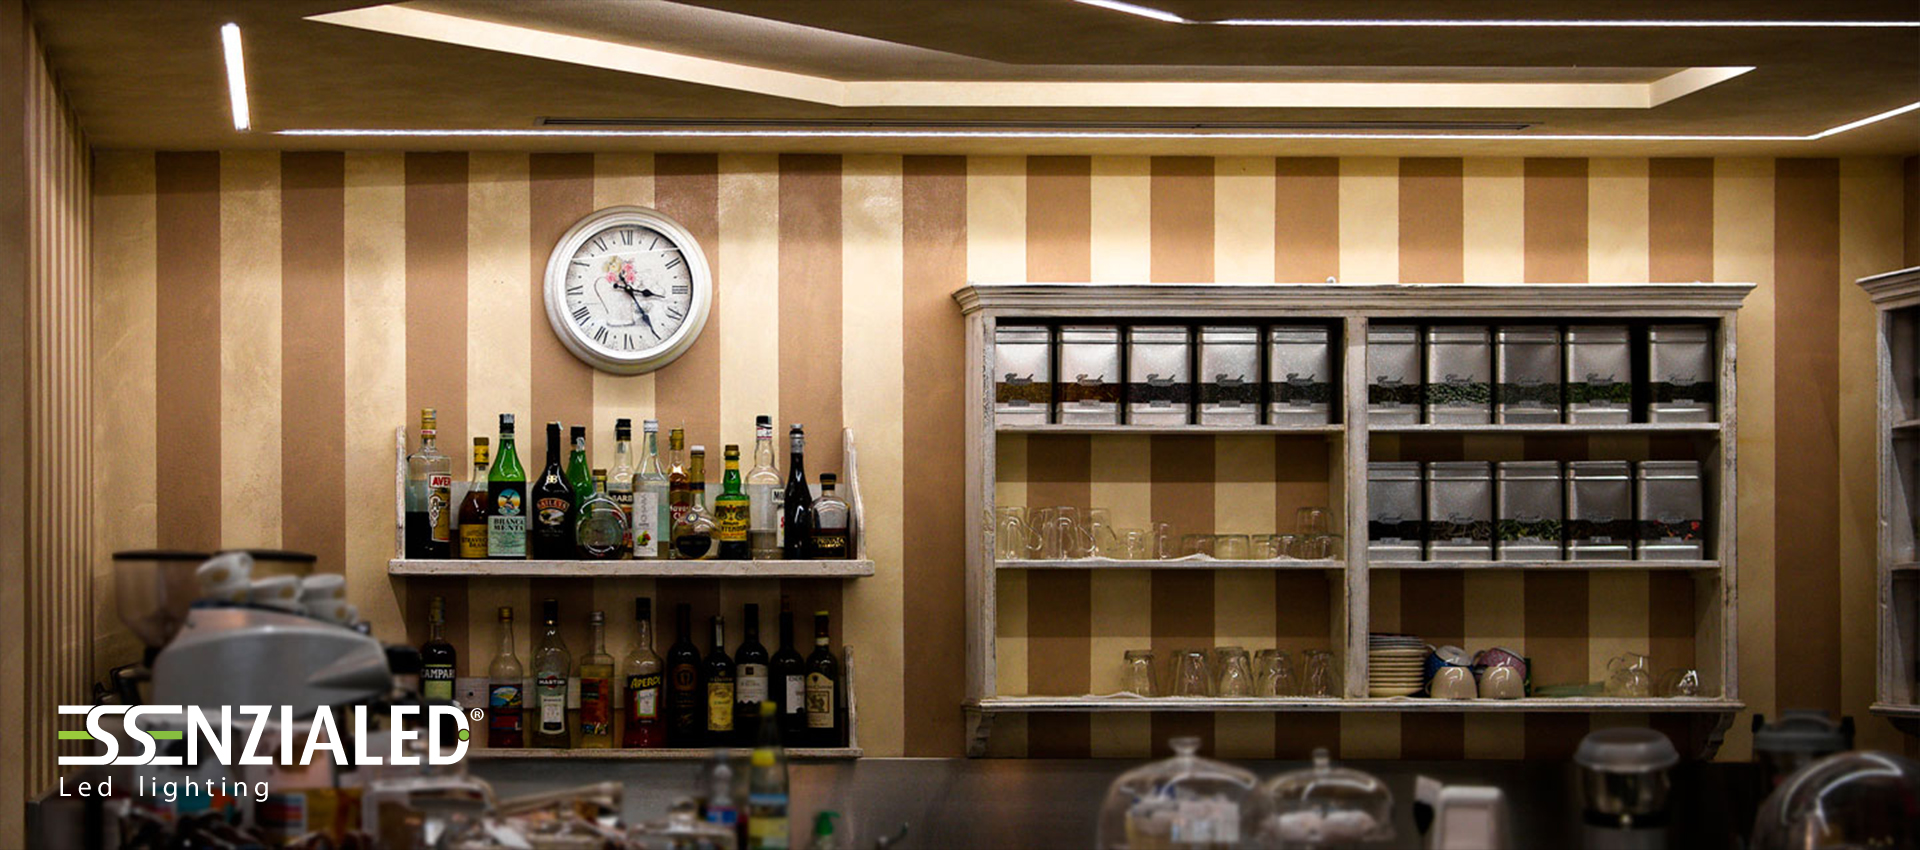 abbastanza Illuminazione Led per ristoranti e bar - EssenzialedEssenzialed  LE04